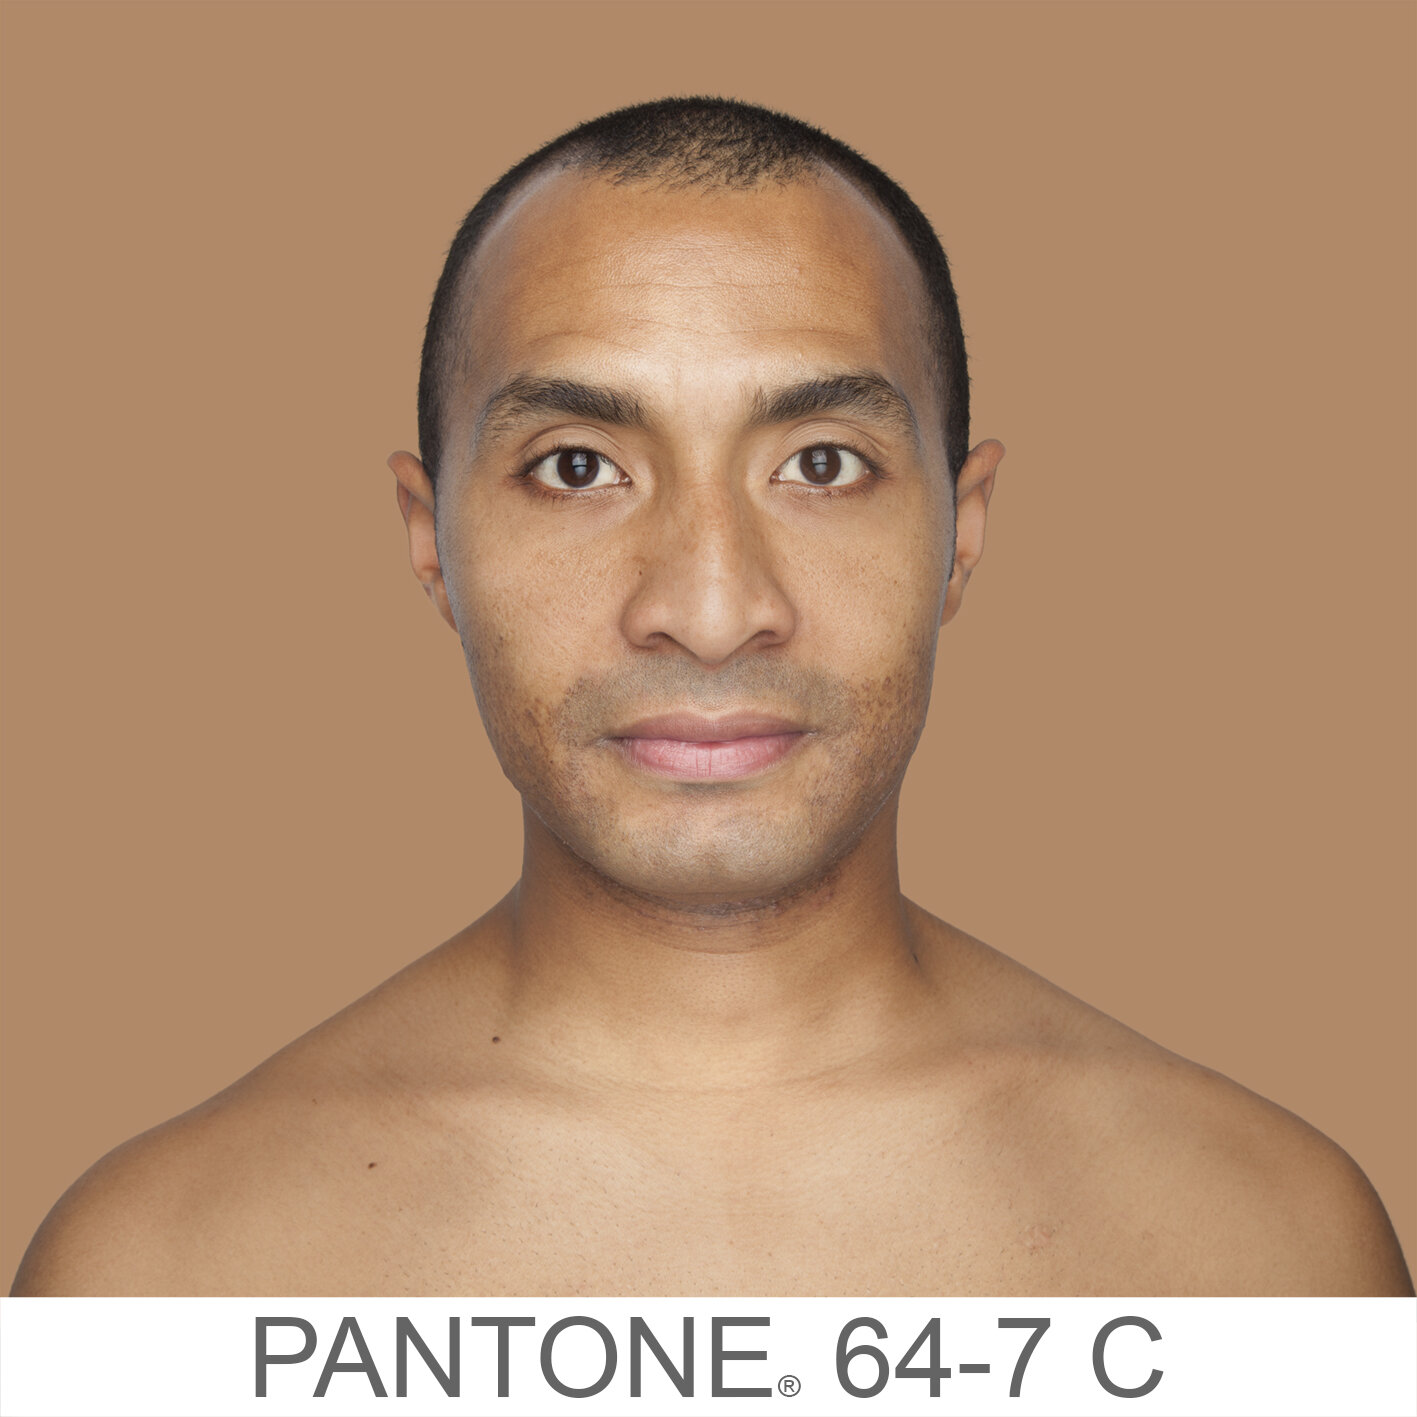 humanae 64-7 C VB copia.jpg